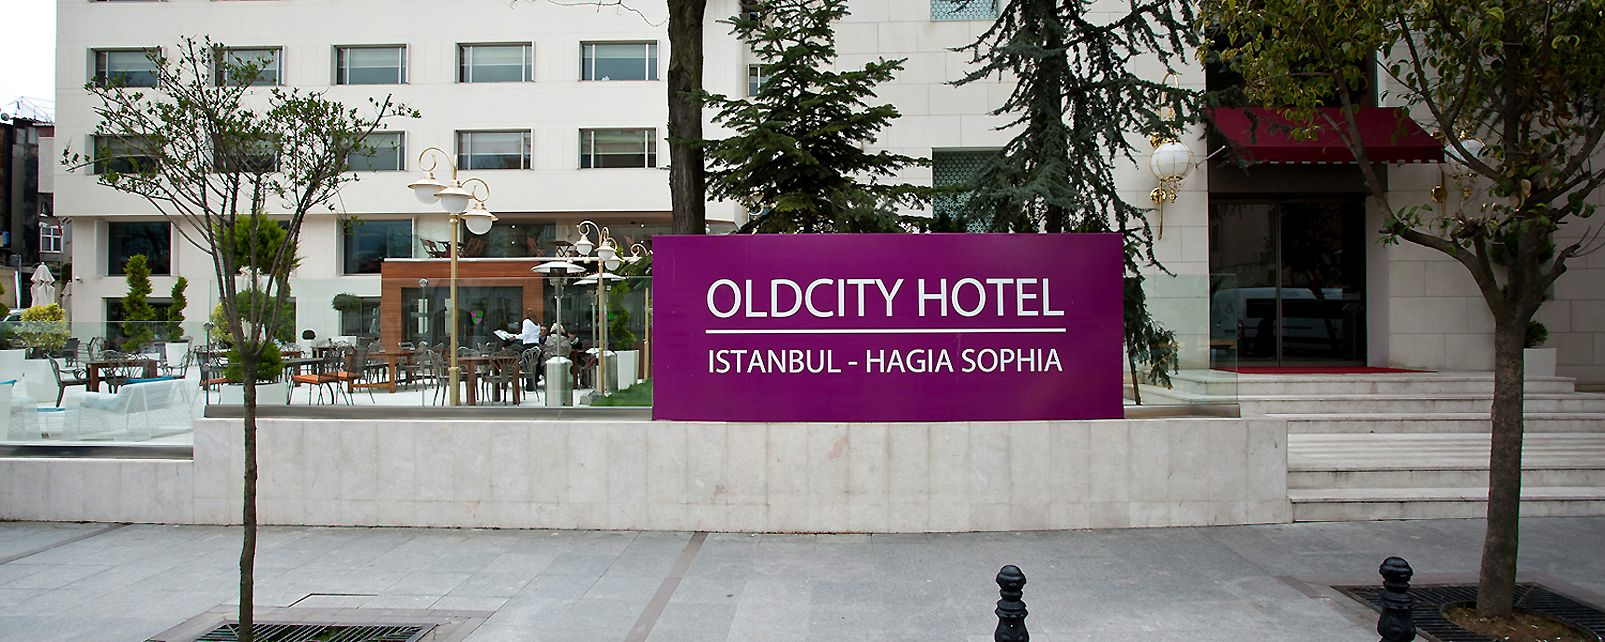 Hôtel Crowne Plaza Hagia Sophia